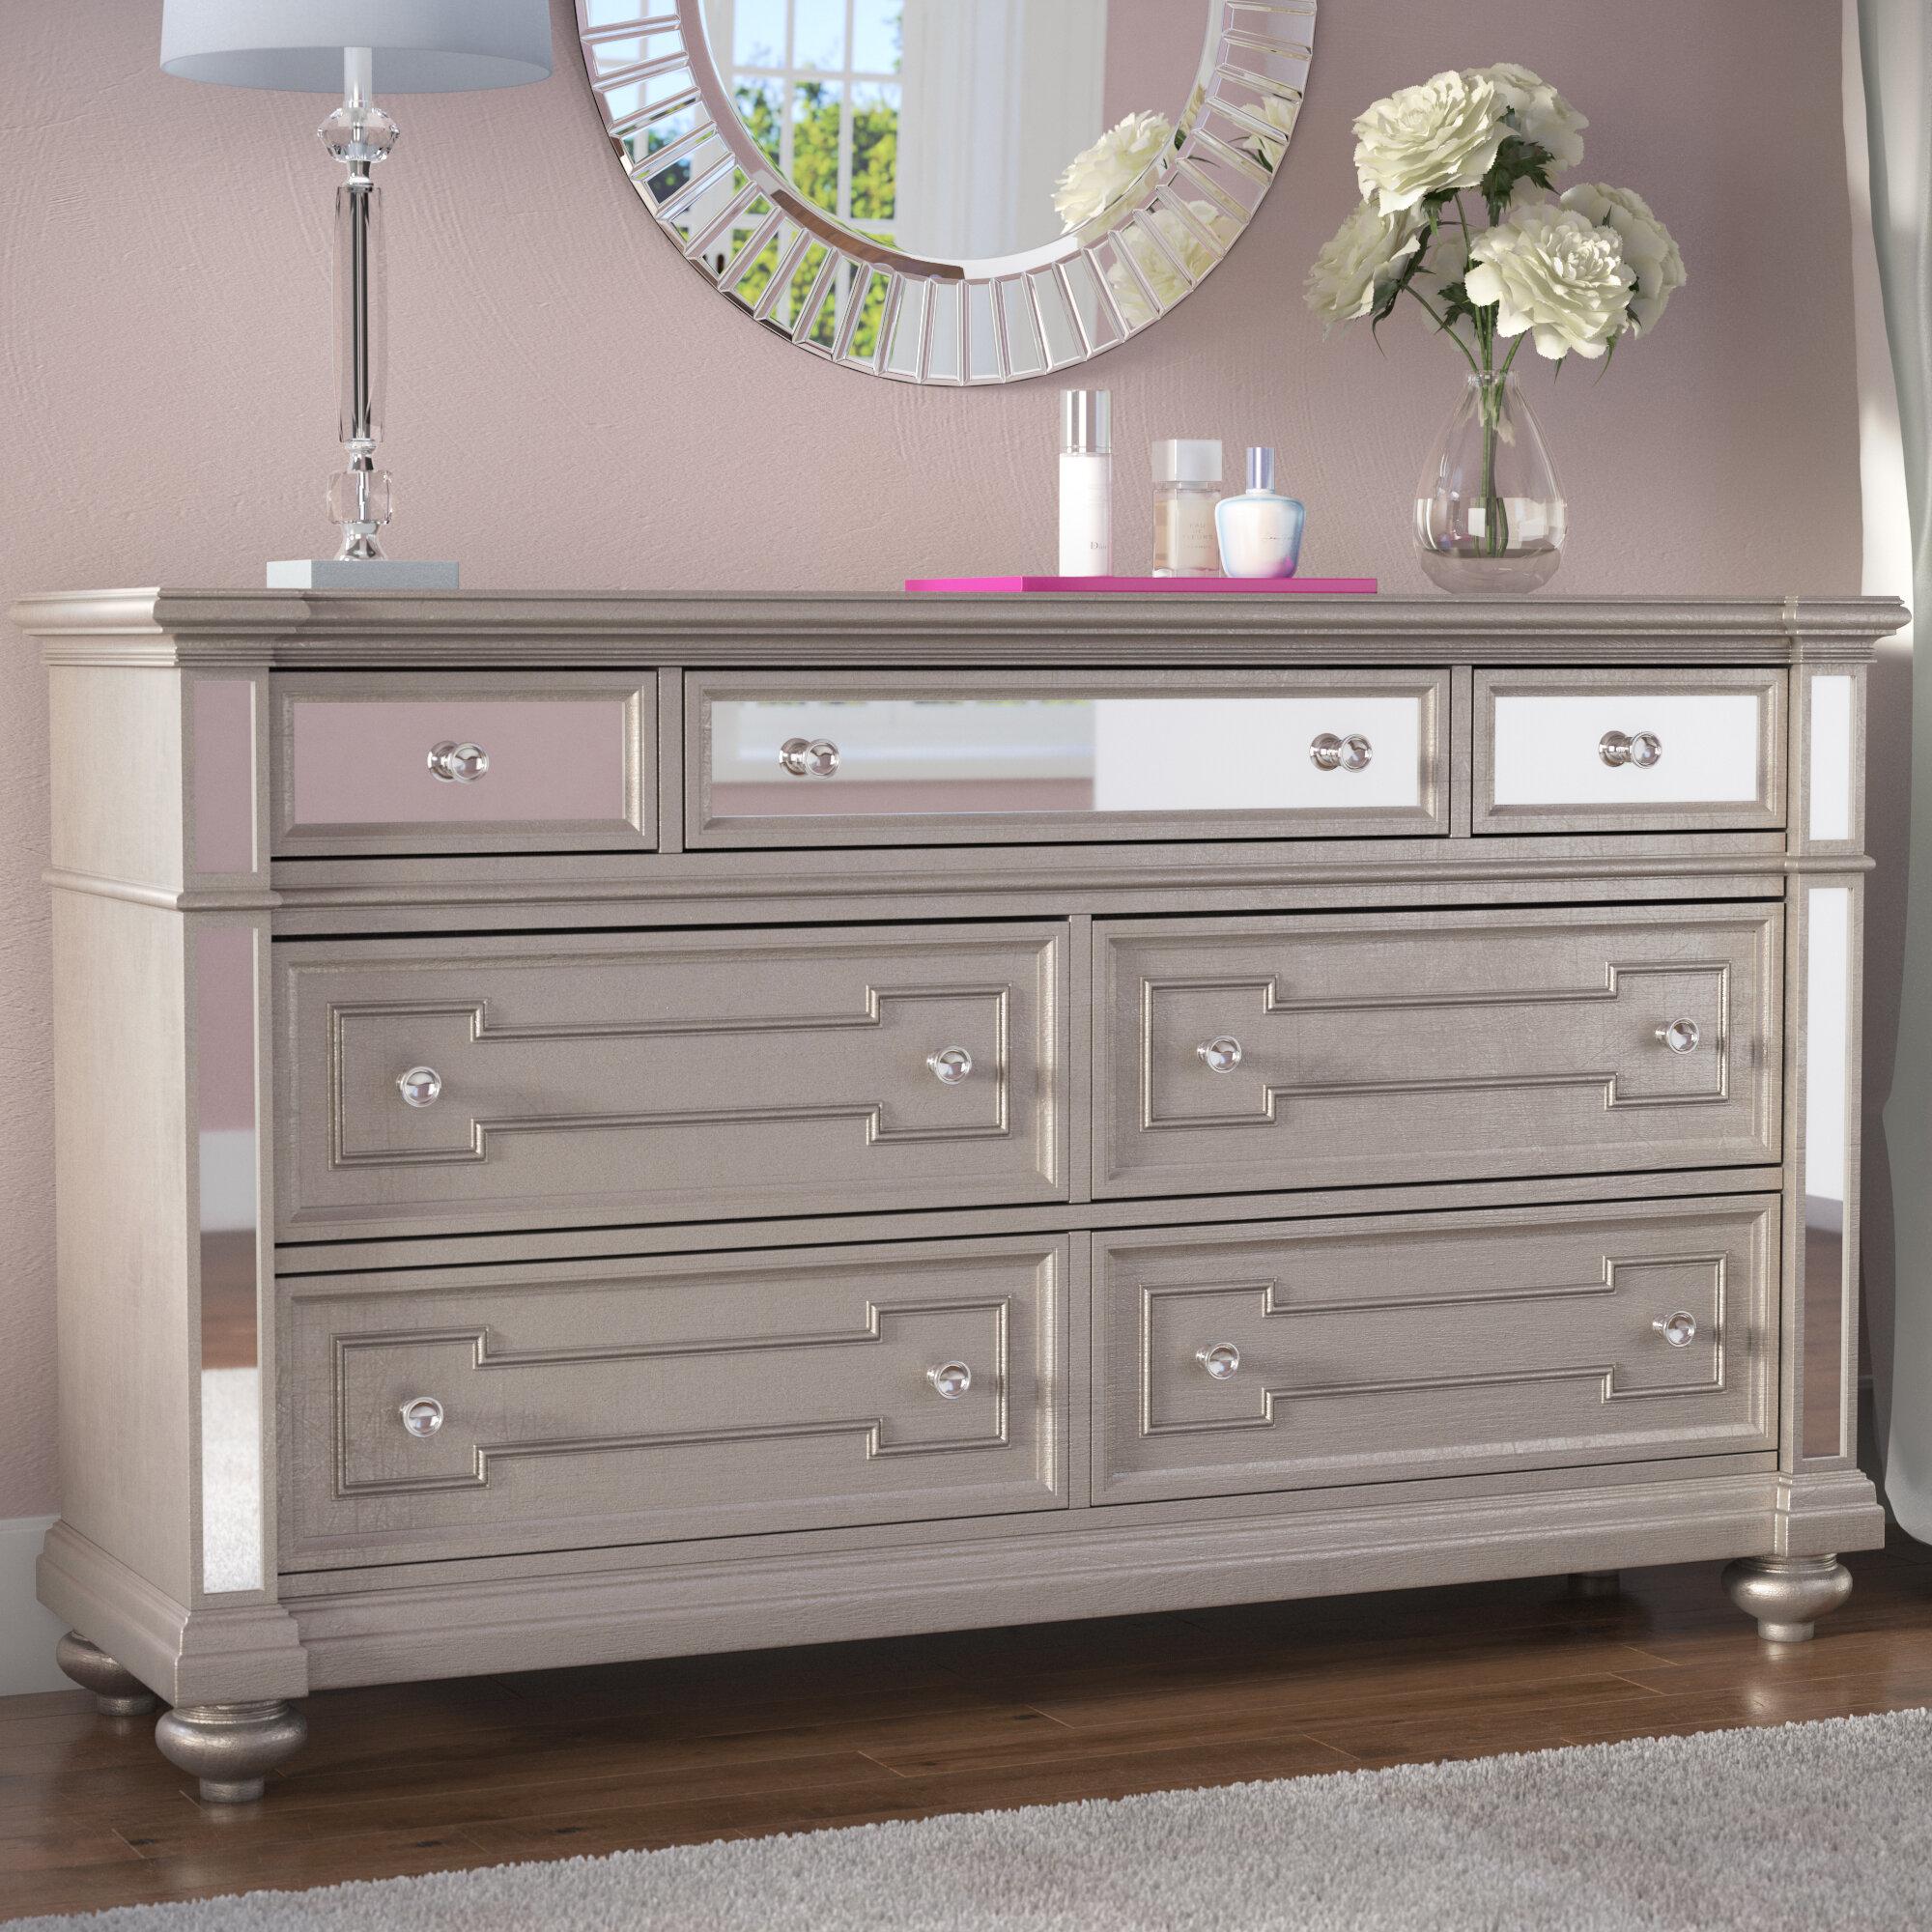 Willa Arlo Interiors Ronna 7 Drawer Dresser Reviews Wayfair